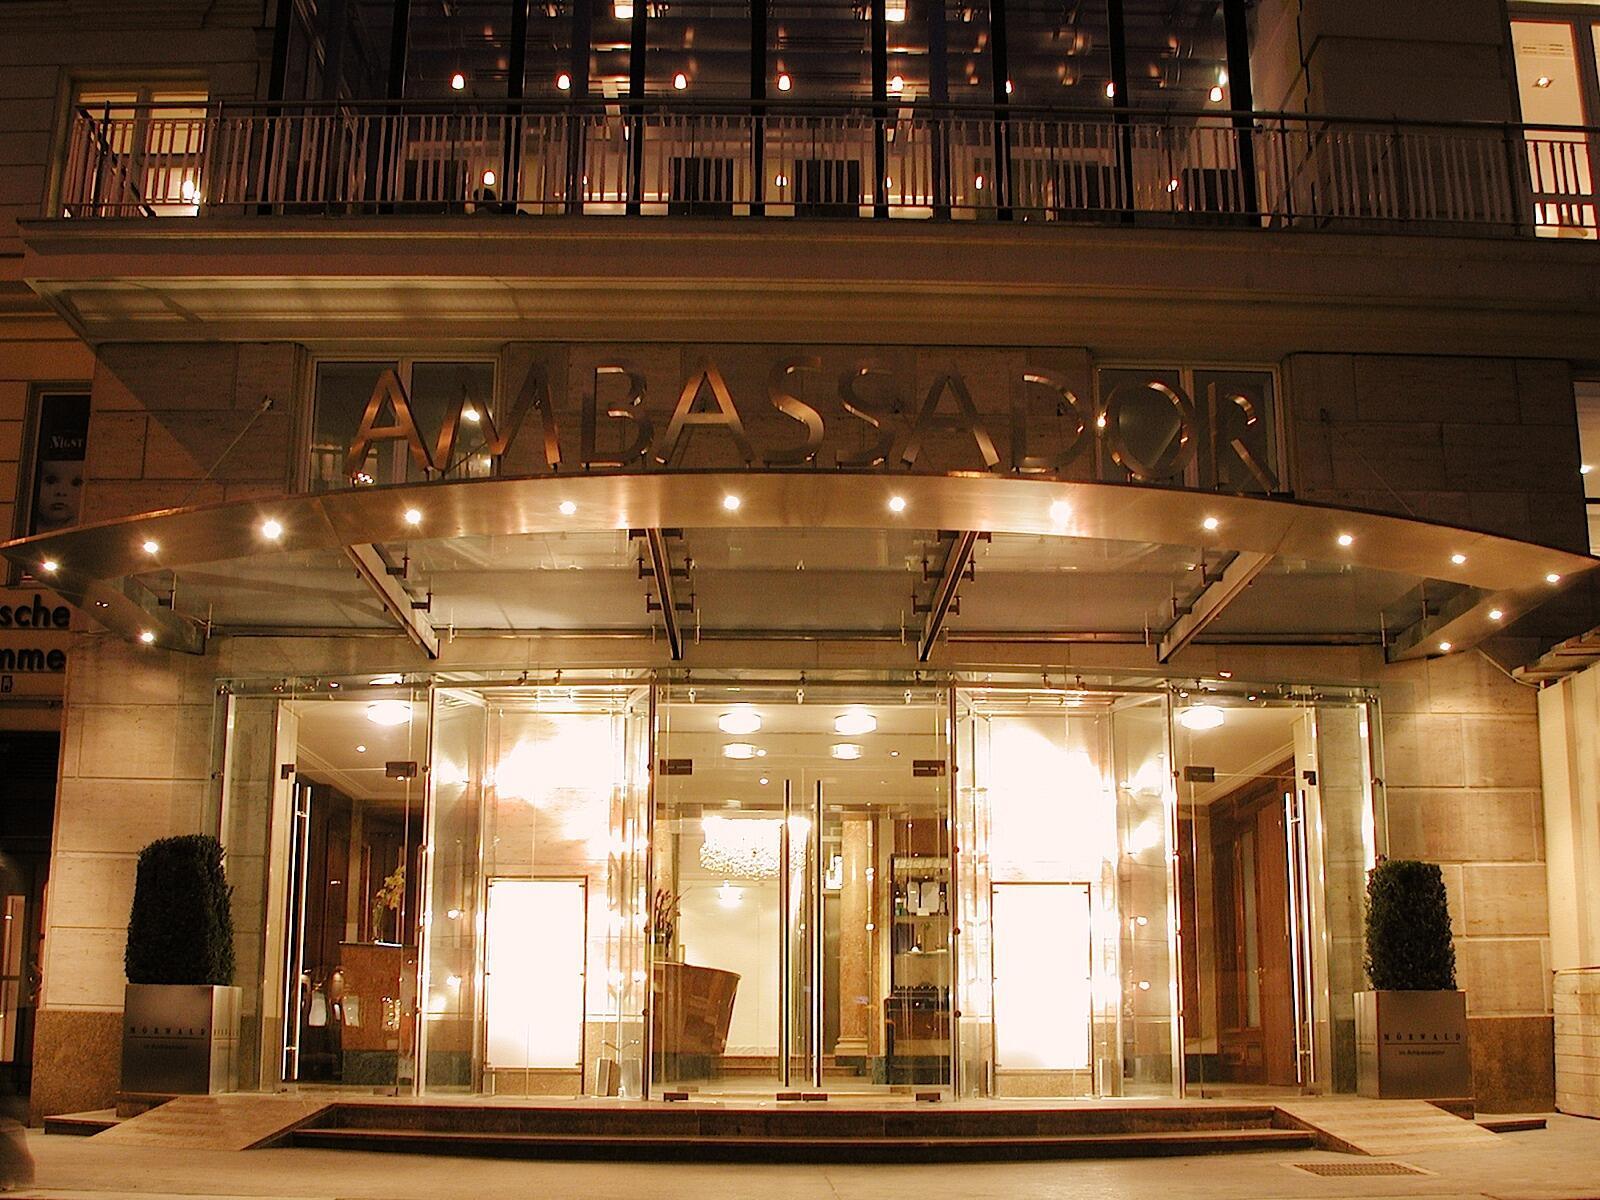 Entrance at Ambassador Hotel in Vienna